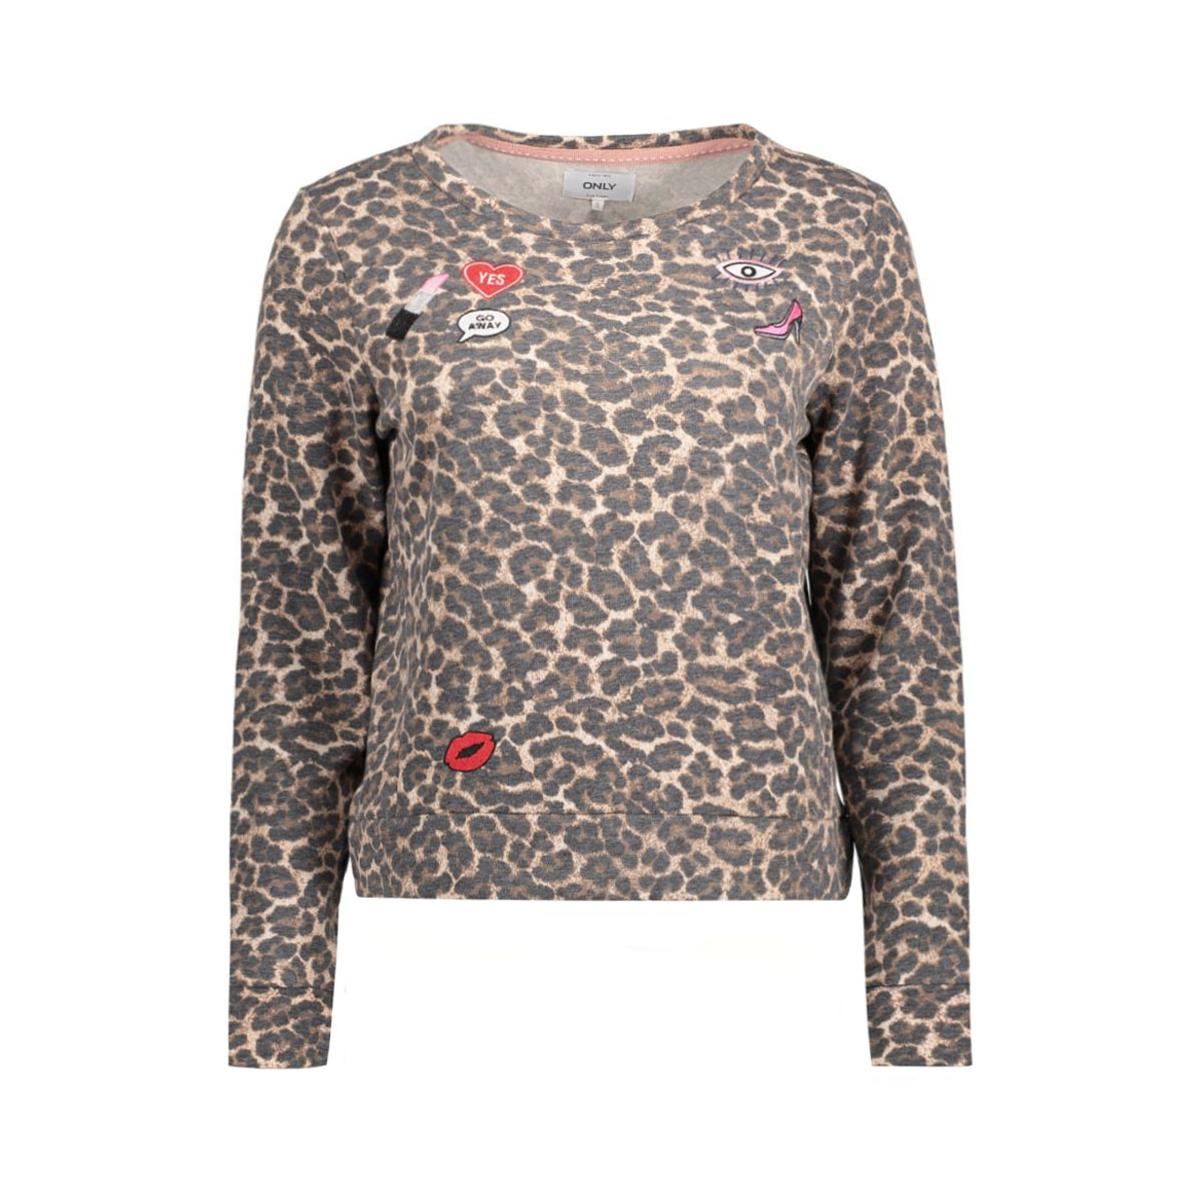 onlmonica l/s leo oneck swt 15128948 only sweater pumice stone/leopard